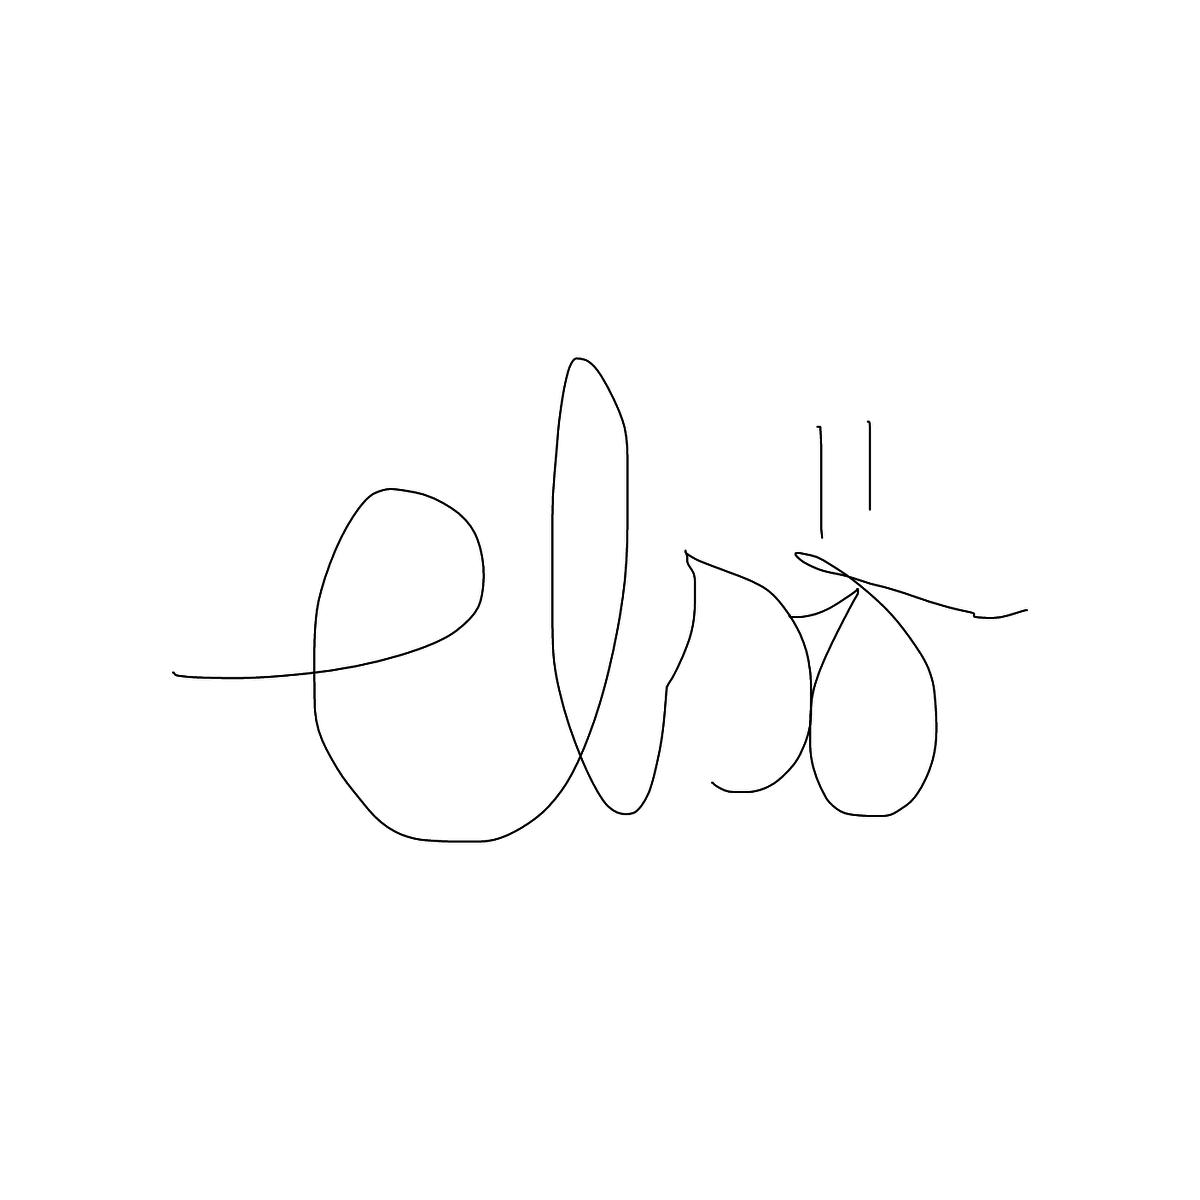 BAAAM drawing#3146 lat:47.4983863830566400lng: 19.0405044555664060